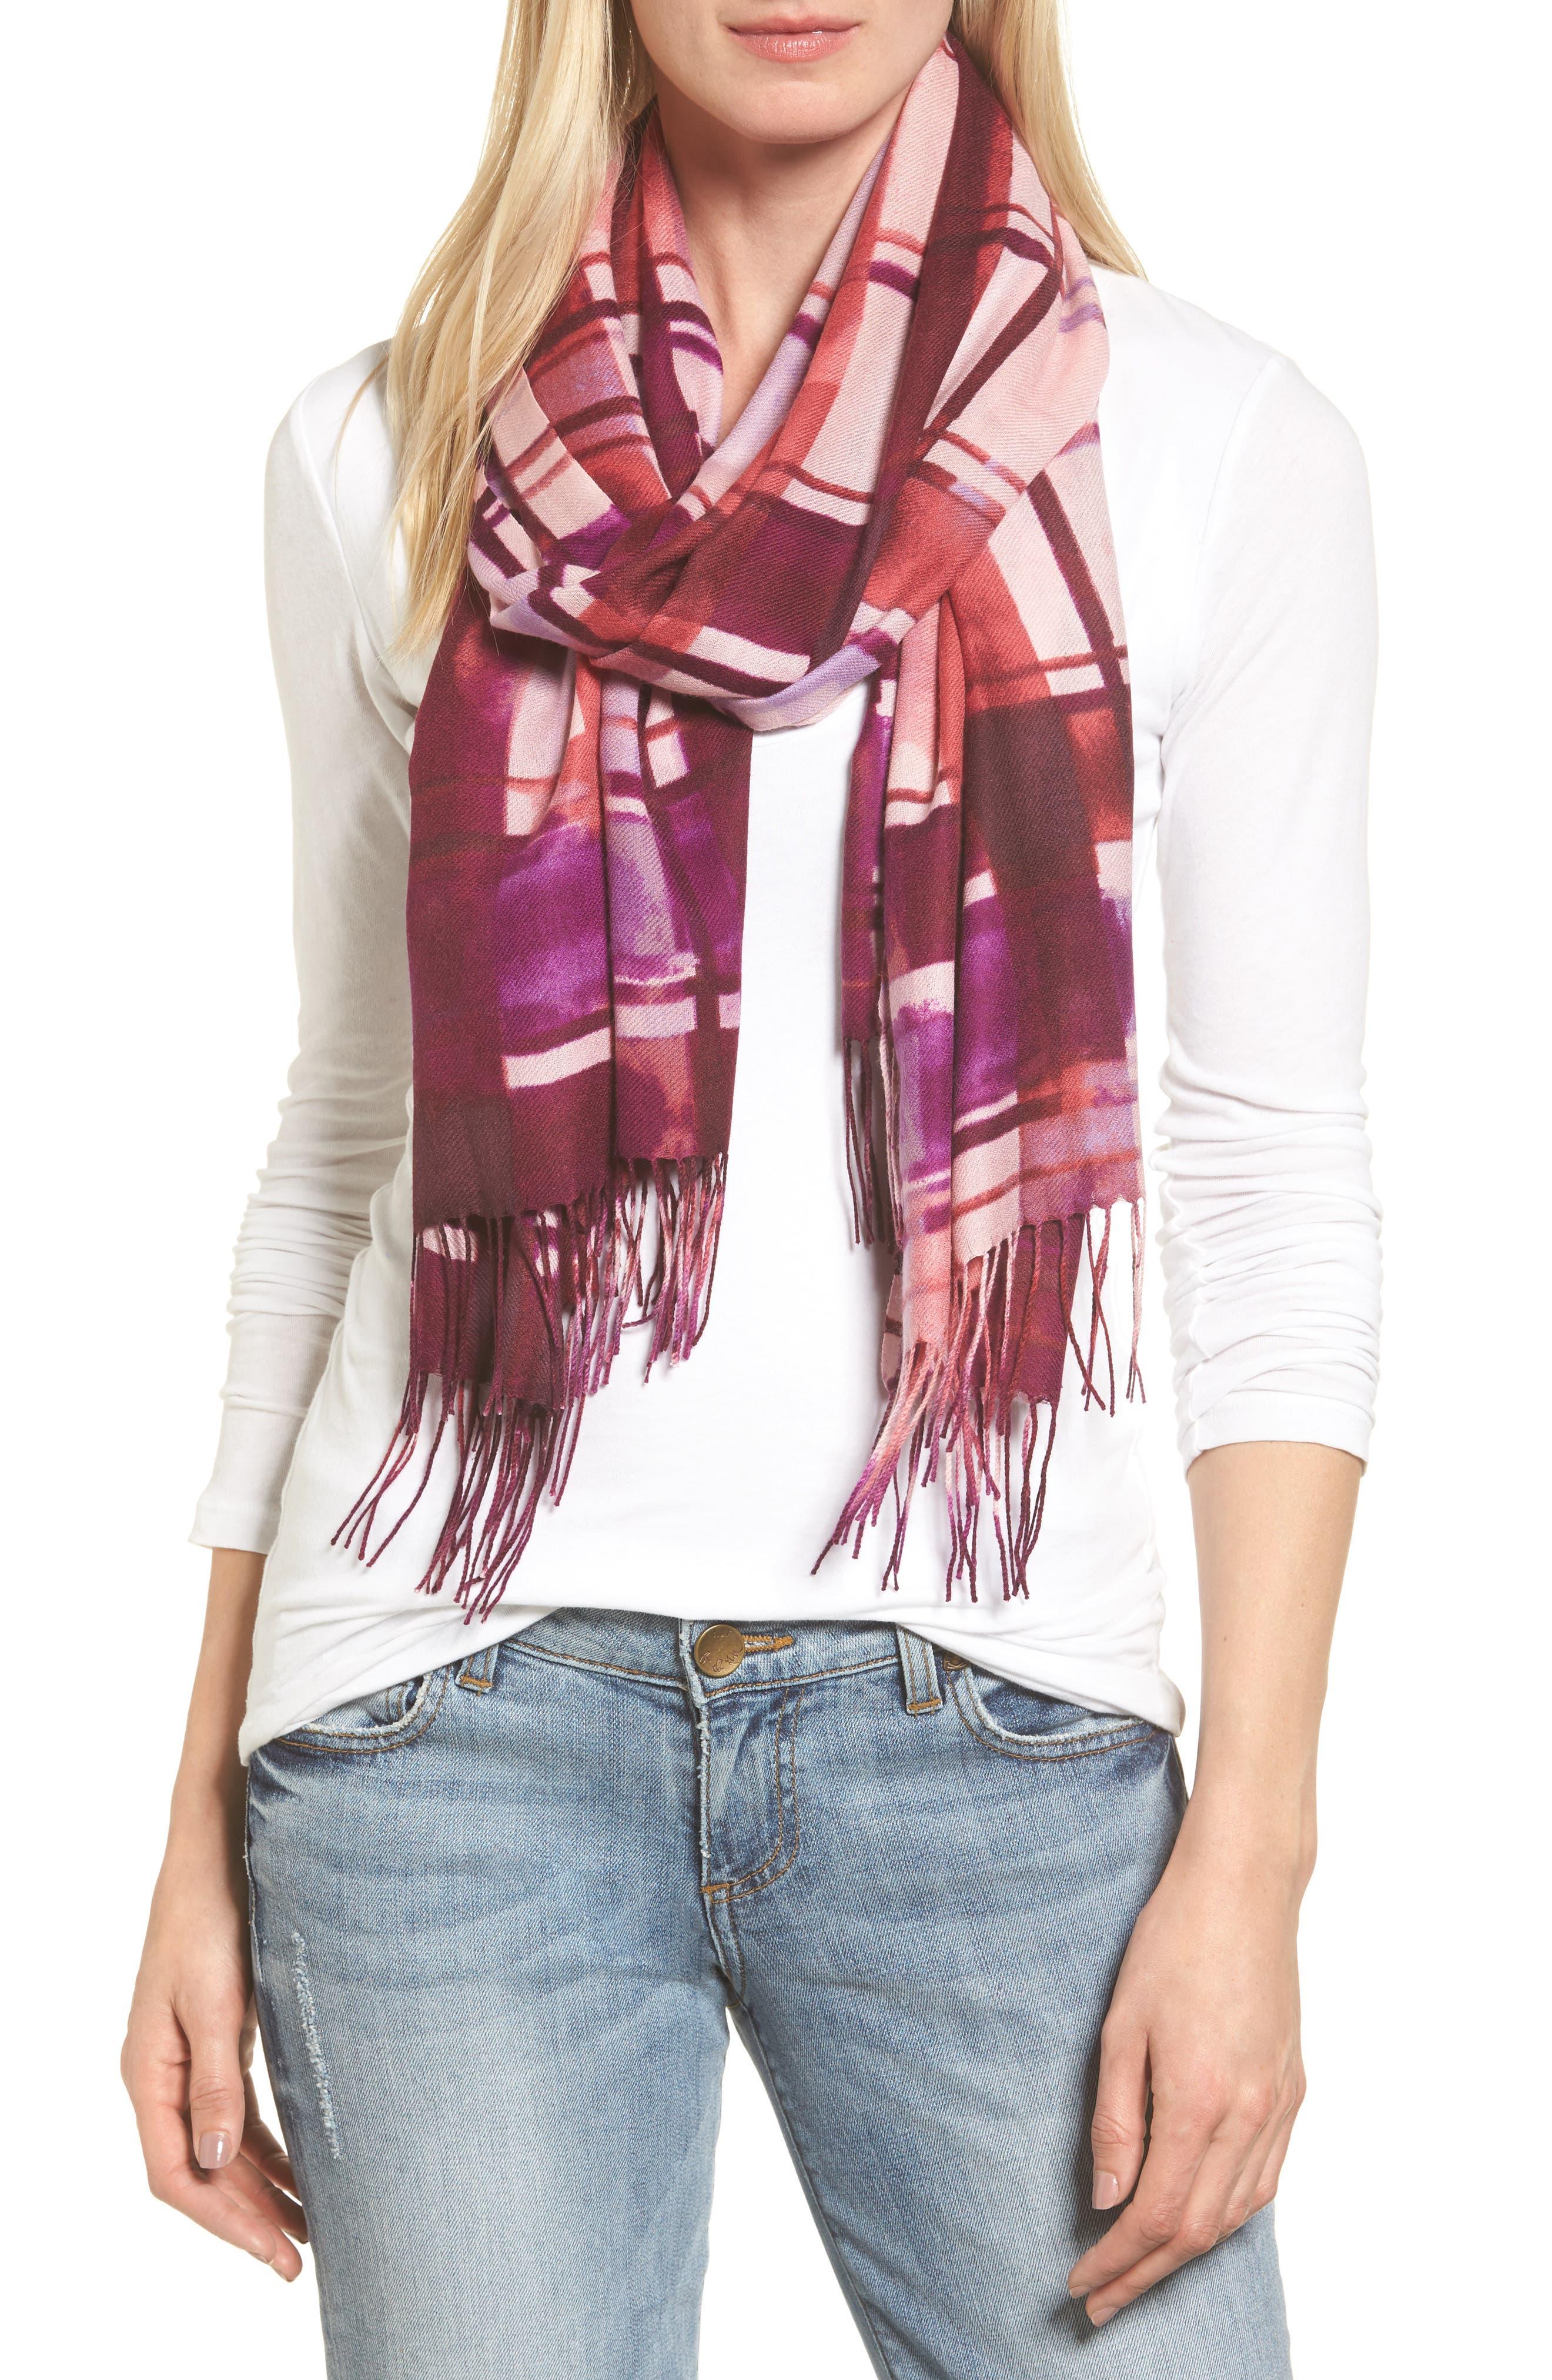 Main Image - Nordstrom Handicraft Plaid Tissue Weight Wool & Cashmere Scarf